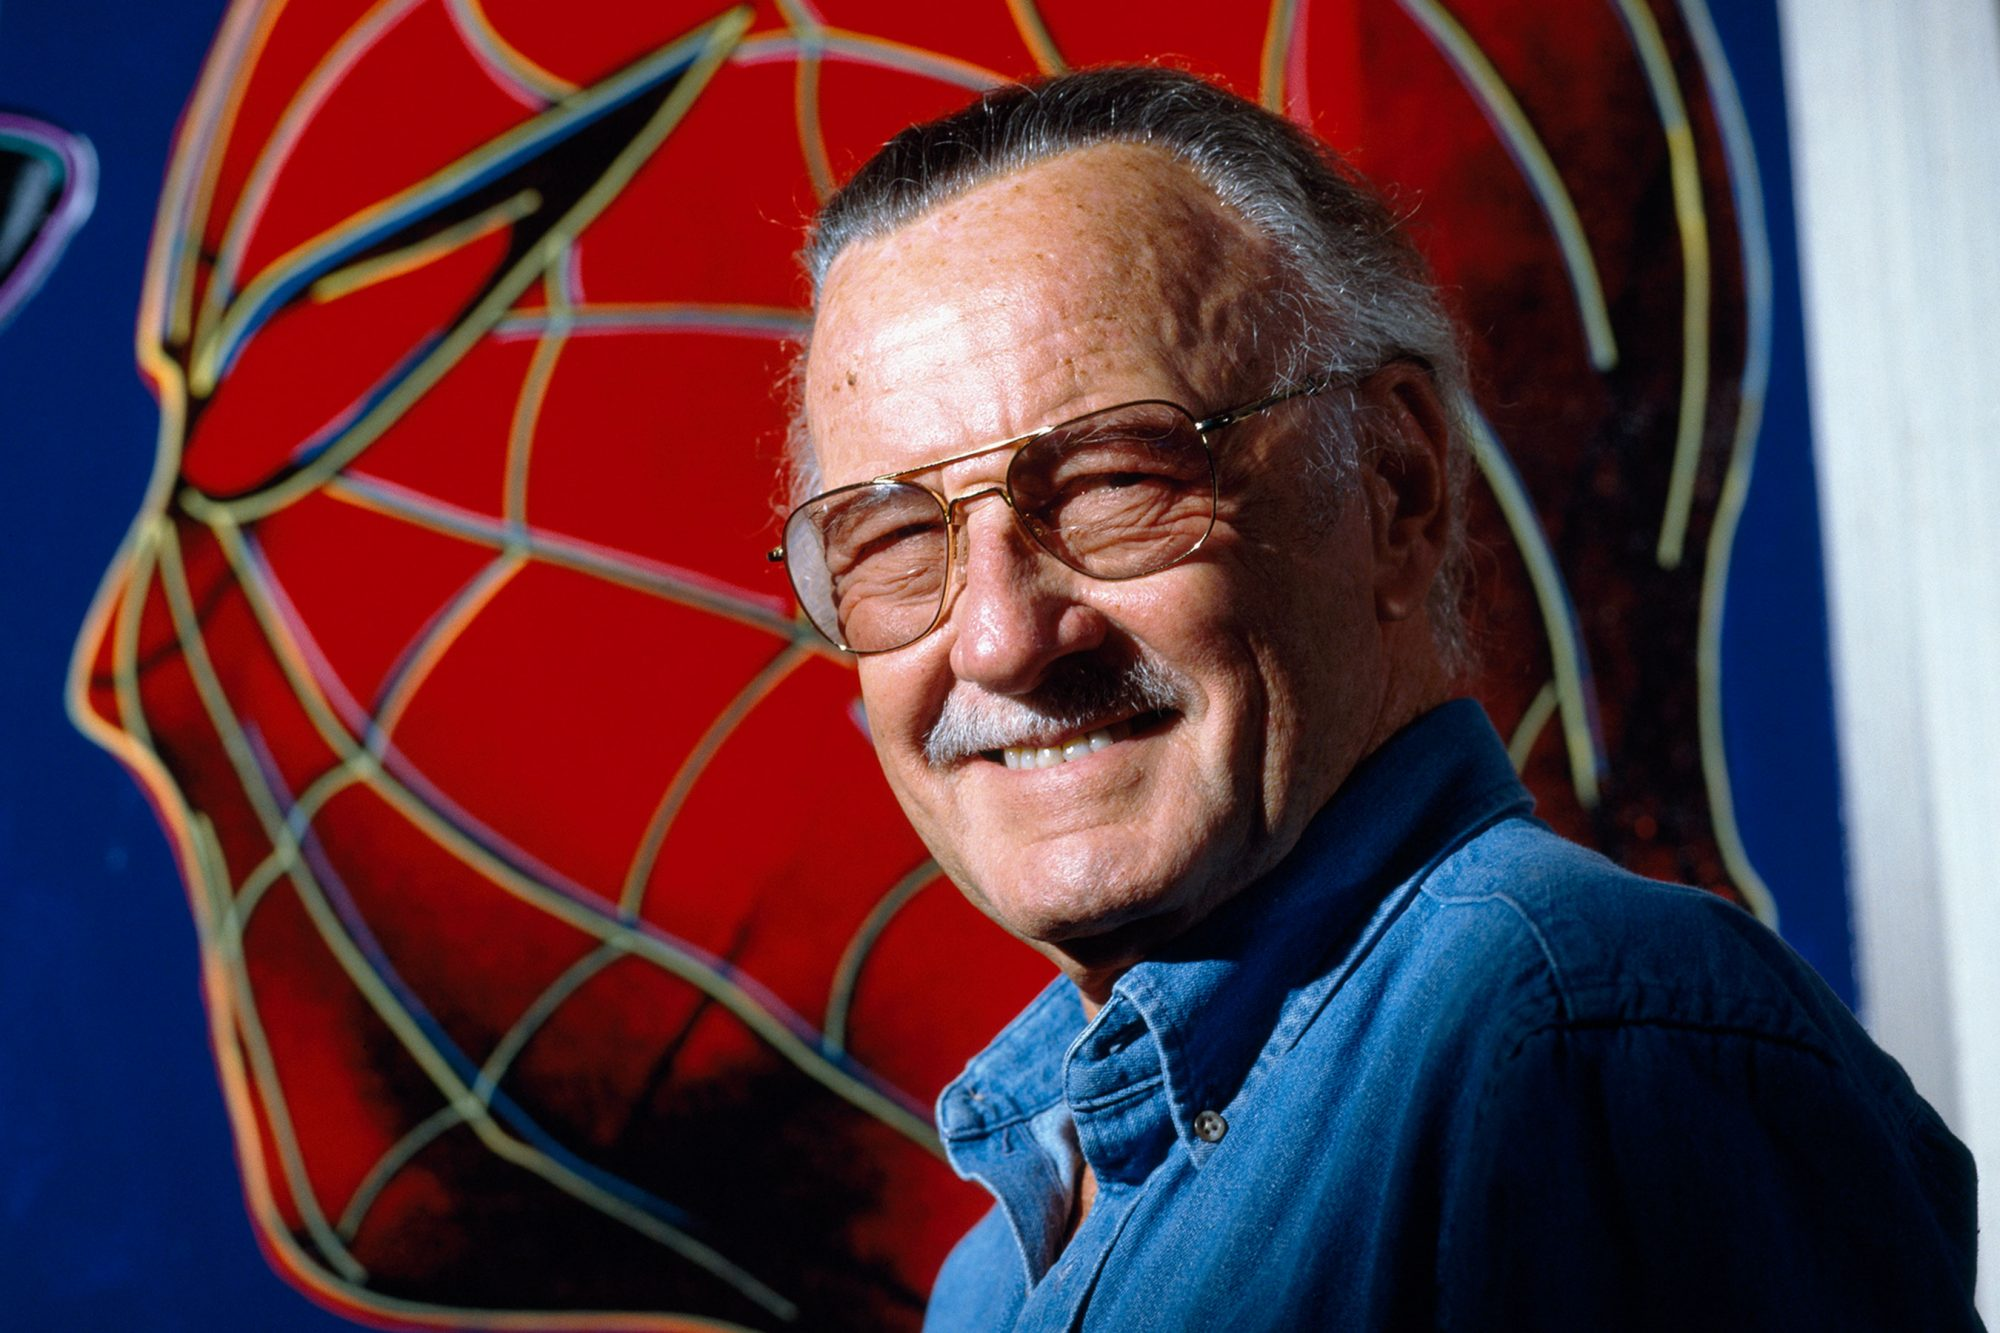 American comic book writer Stan Lee